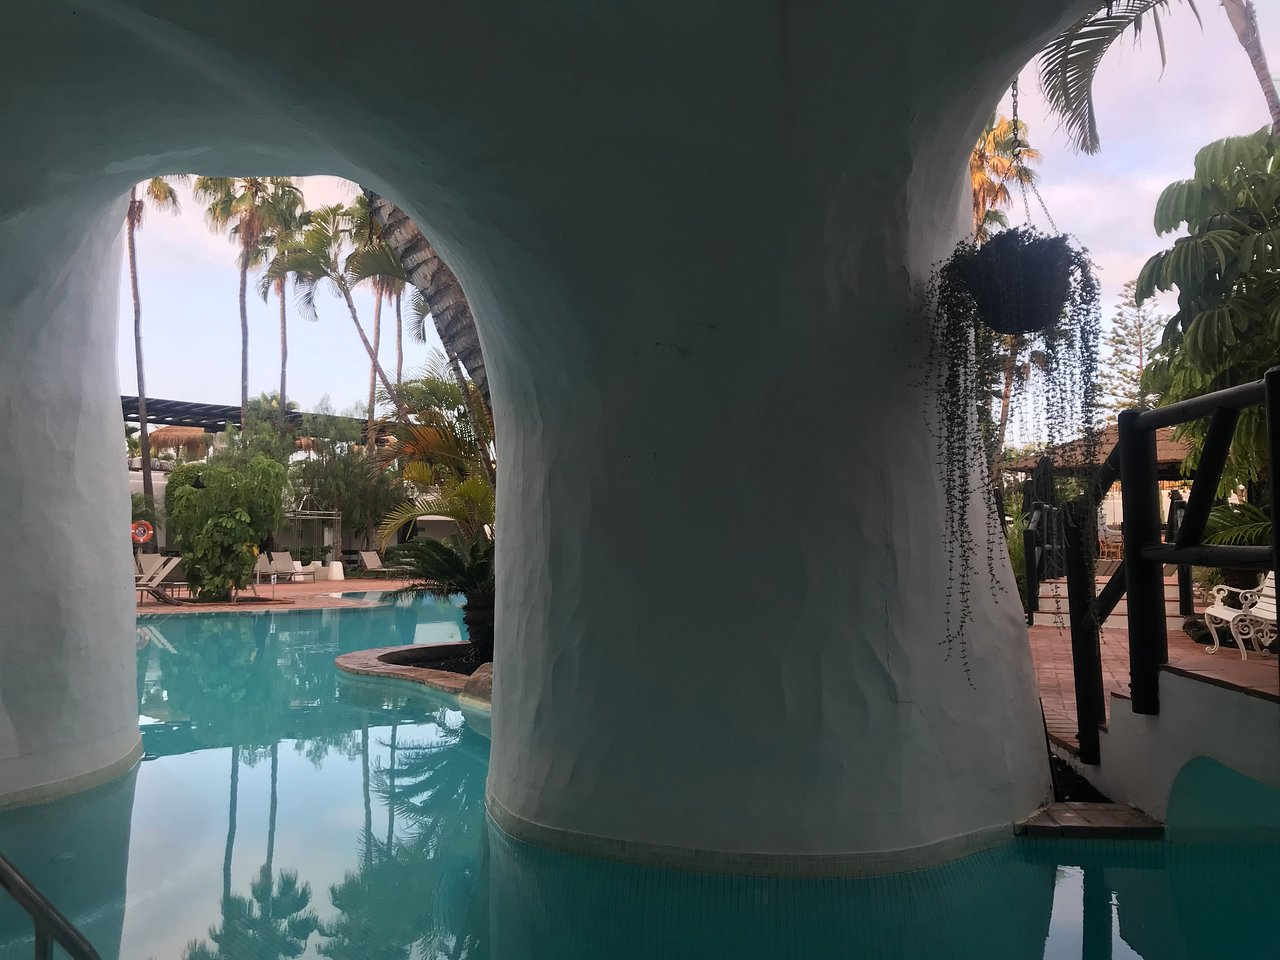 Hotel Jardin Tropical Costa Adeje Espagne Voir Les Tarifs Et 21